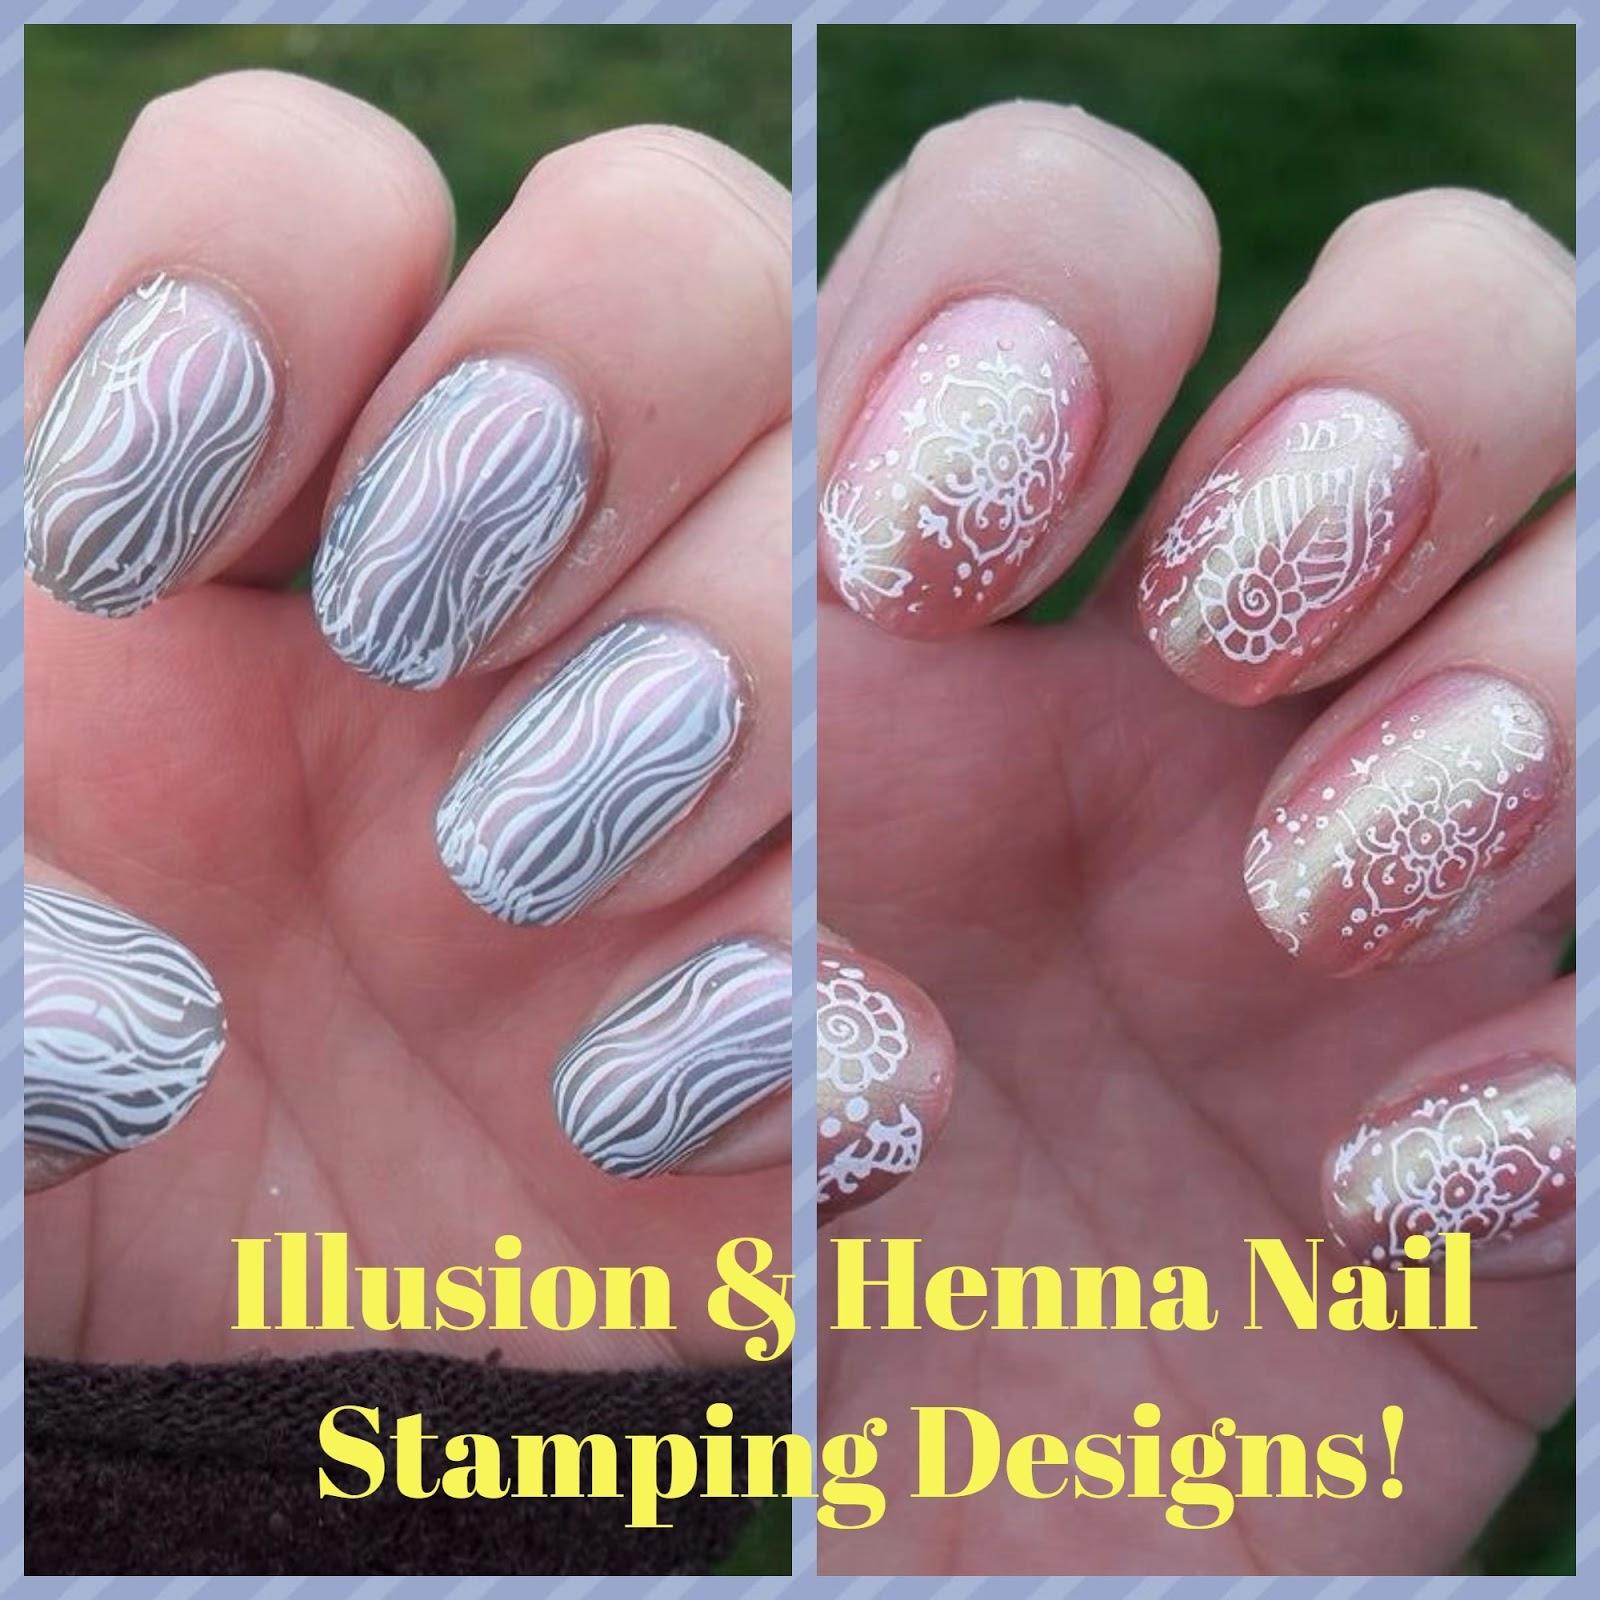 Illusion & henna nail stamping designs!